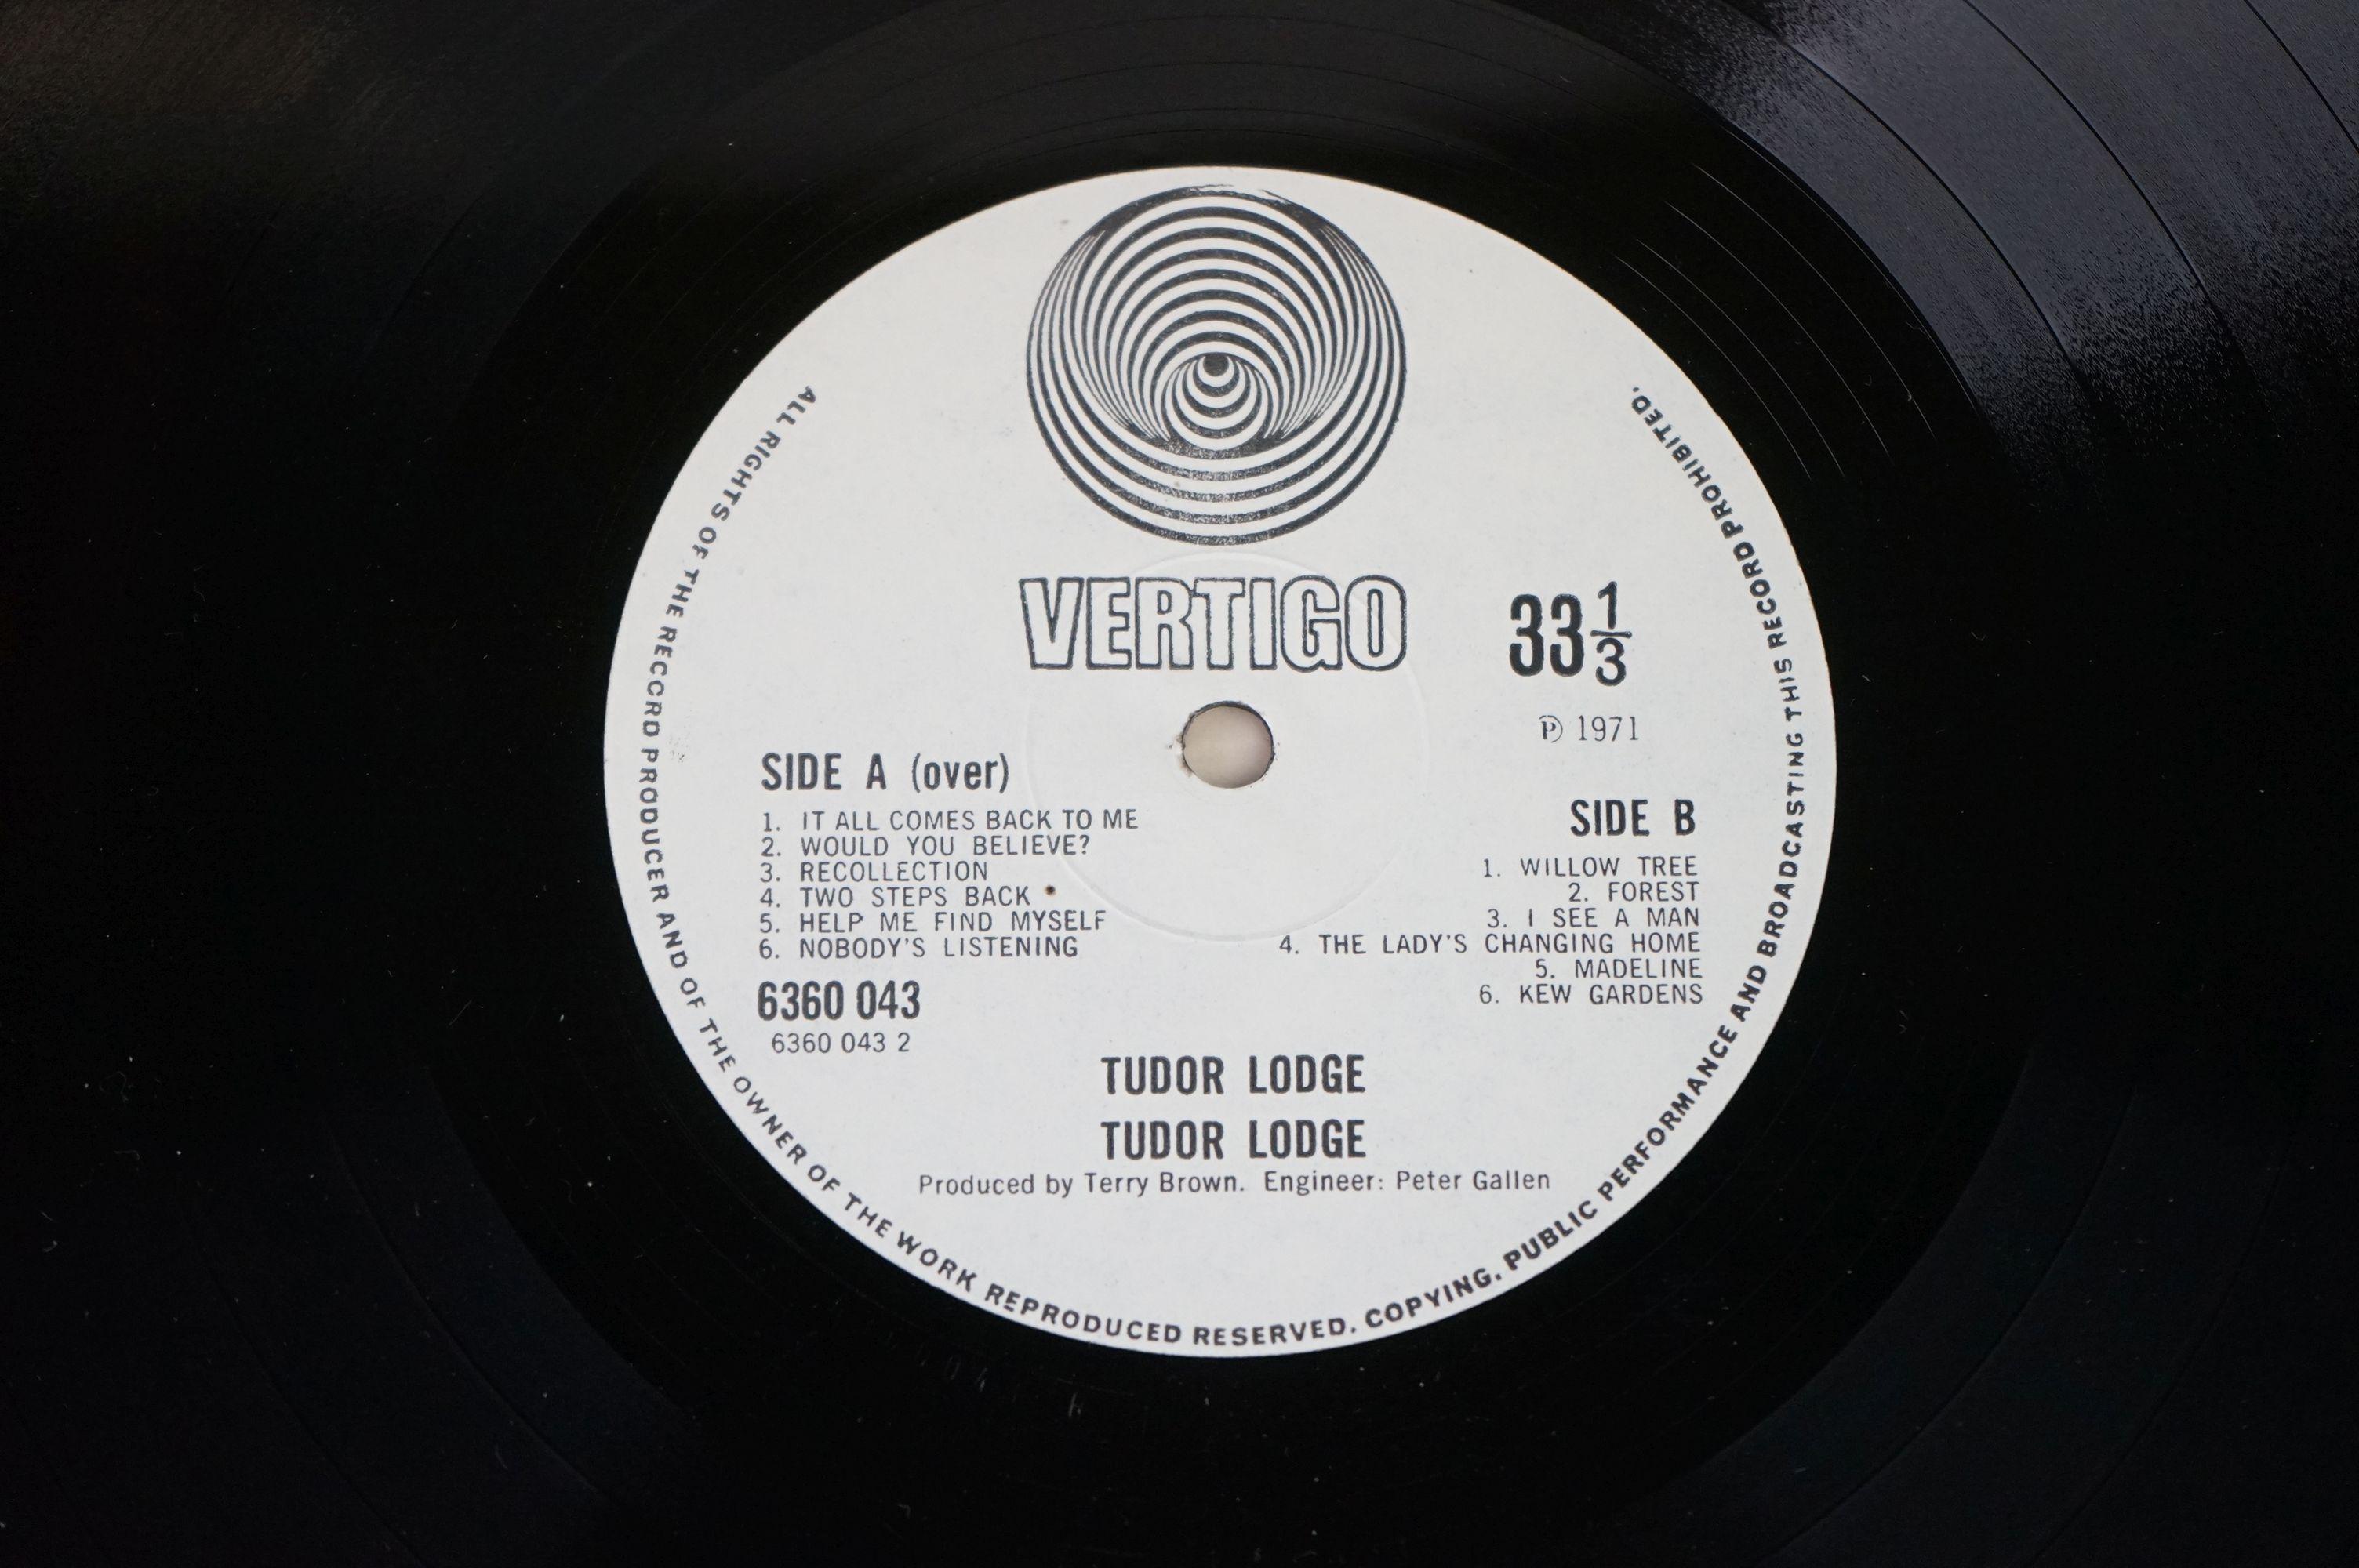 Vinyl - Tudor Lodge self titled LP on Vertigo 6360043 Unofficial release, not play tested - Image 6 of 7